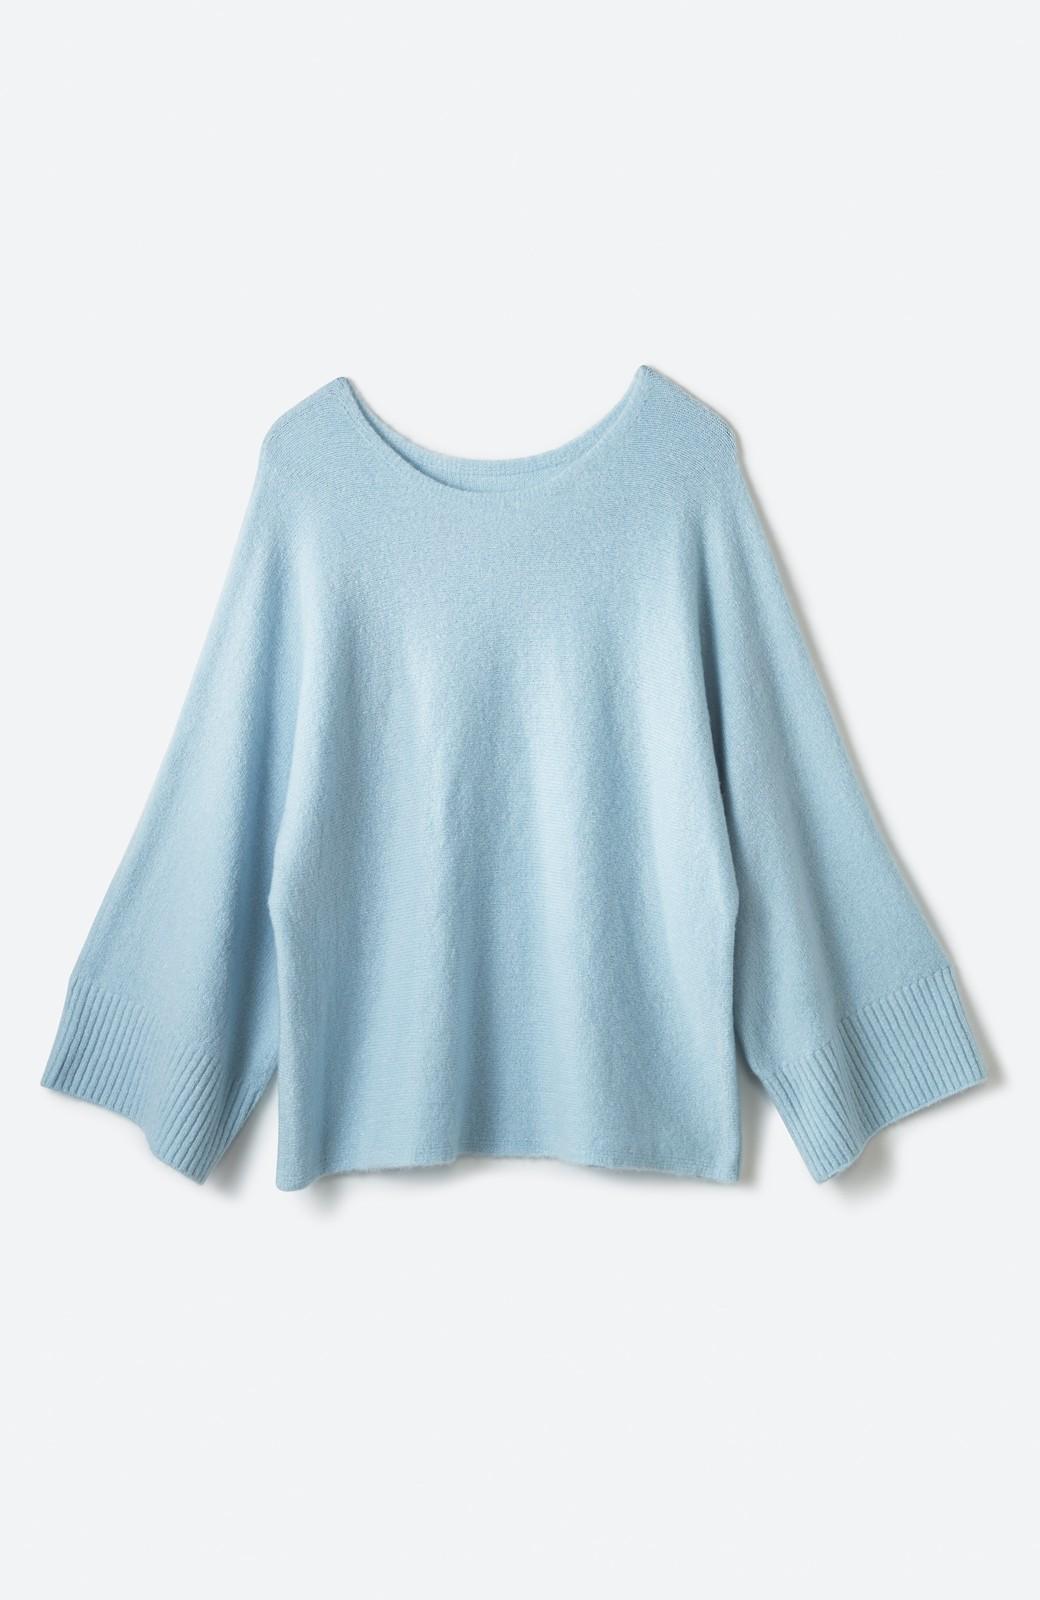 haco! 太め袖がかわいい横編みプルオーバーニット <ライトブルー>の商品写真2